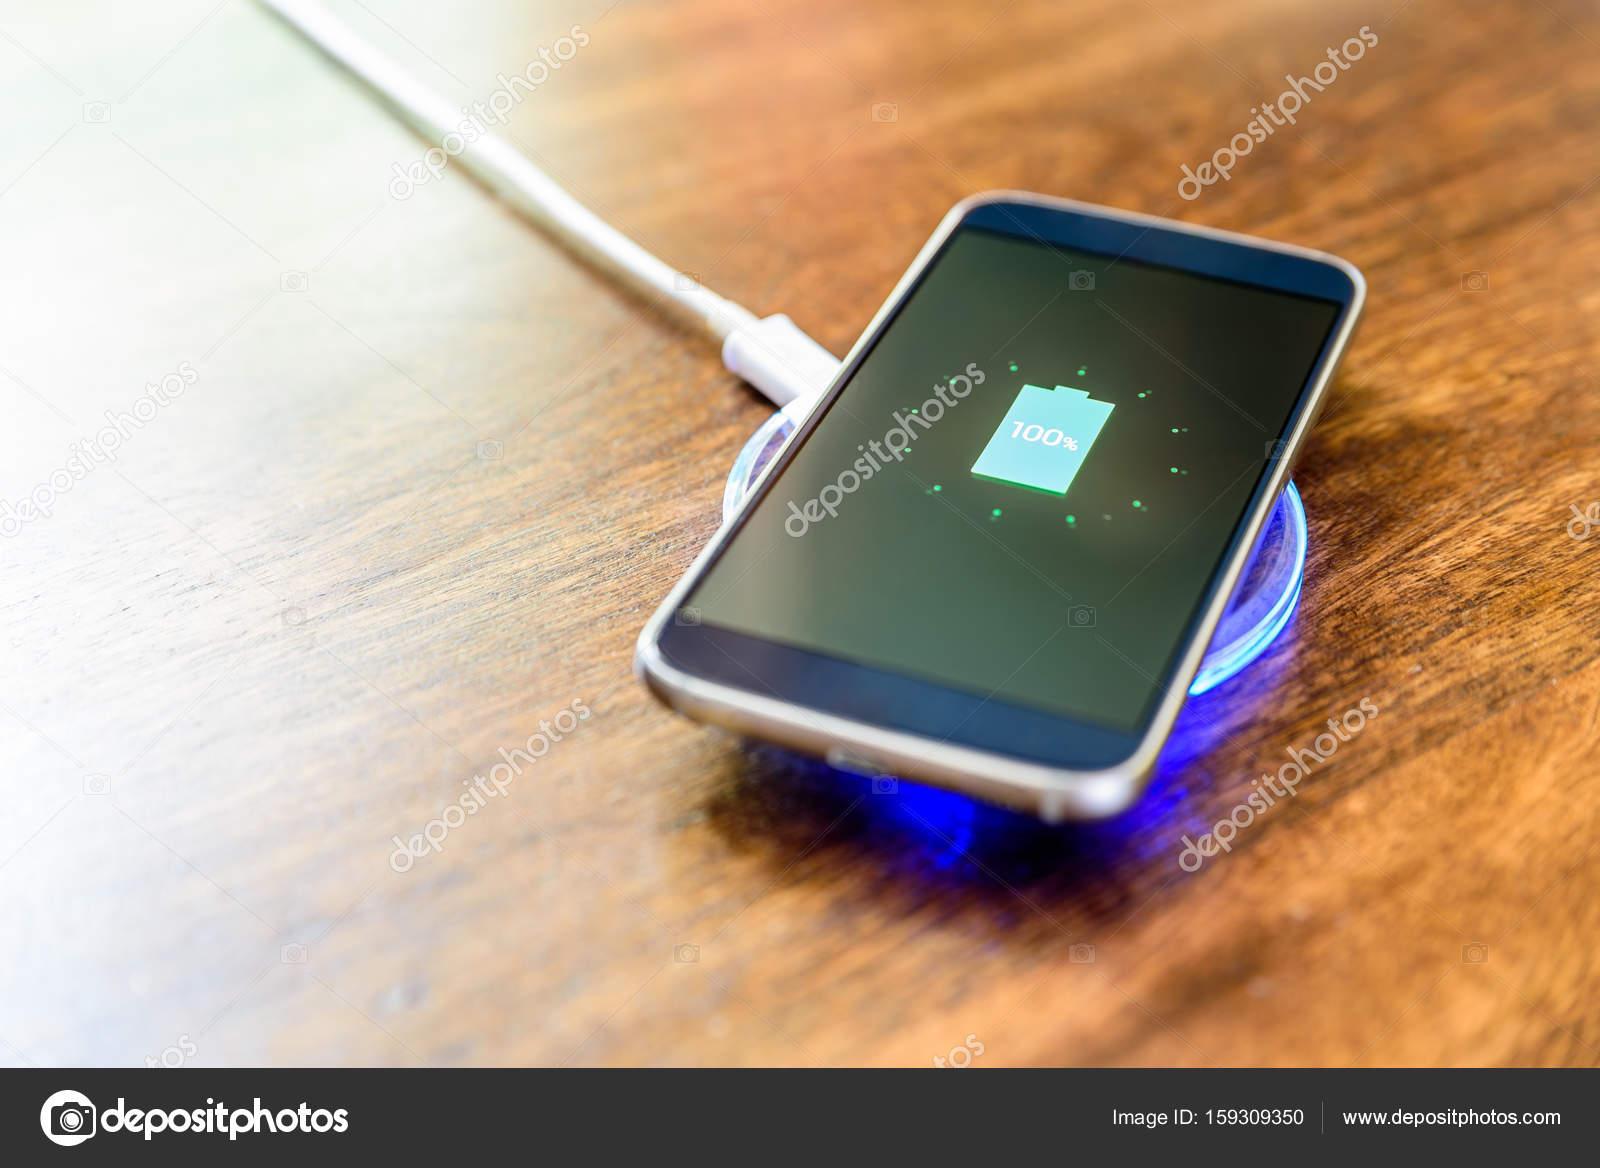 ladestation smartphone best fr die verbindung von ladestation zu tablet oder smartphone benutzt. Black Bedroom Furniture Sets. Home Design Ideas